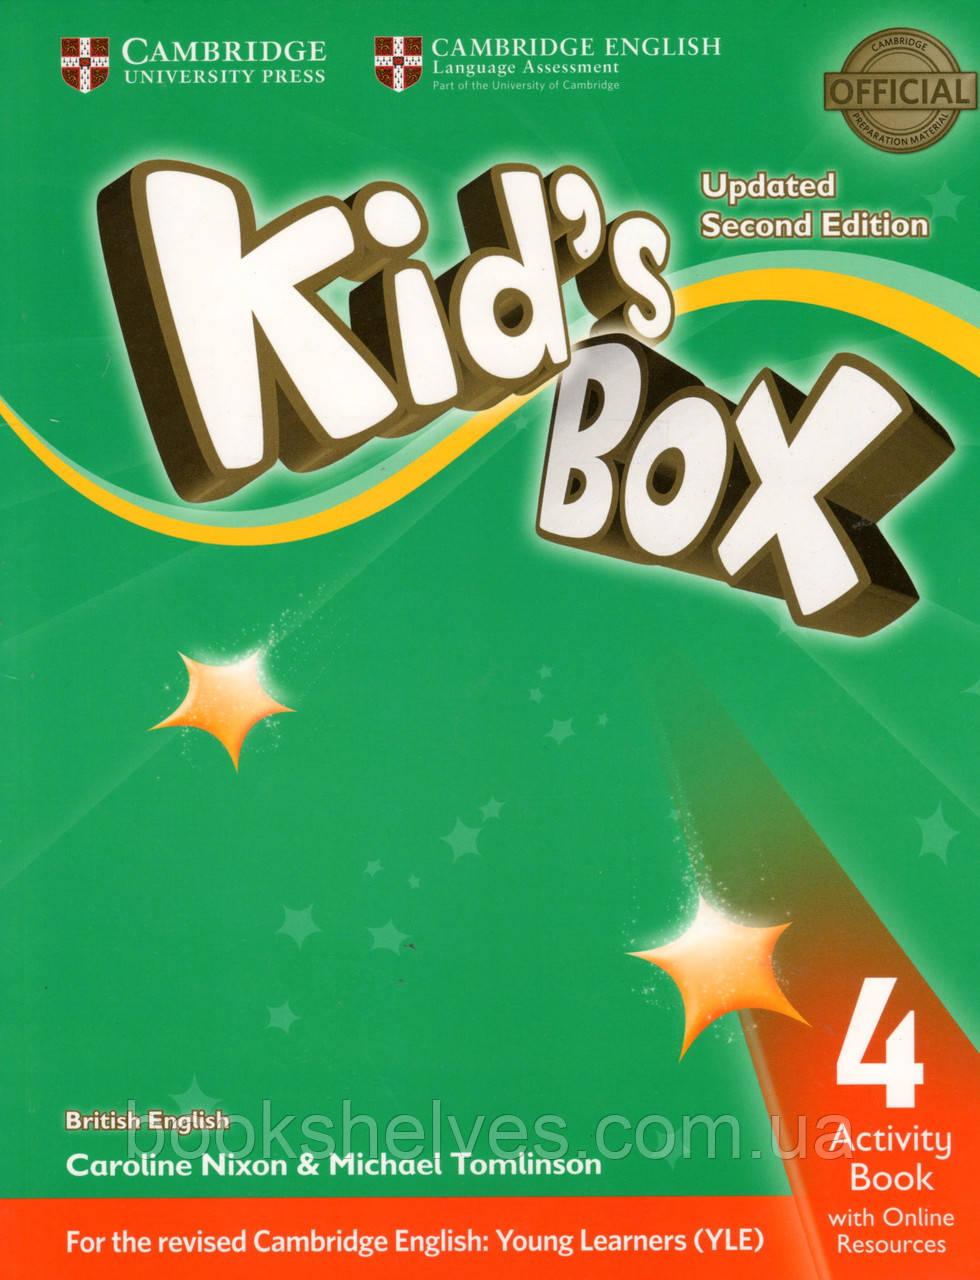 Робочий зошит kid's Box Updated 2nd Edition 4 Activity book + Online Resources